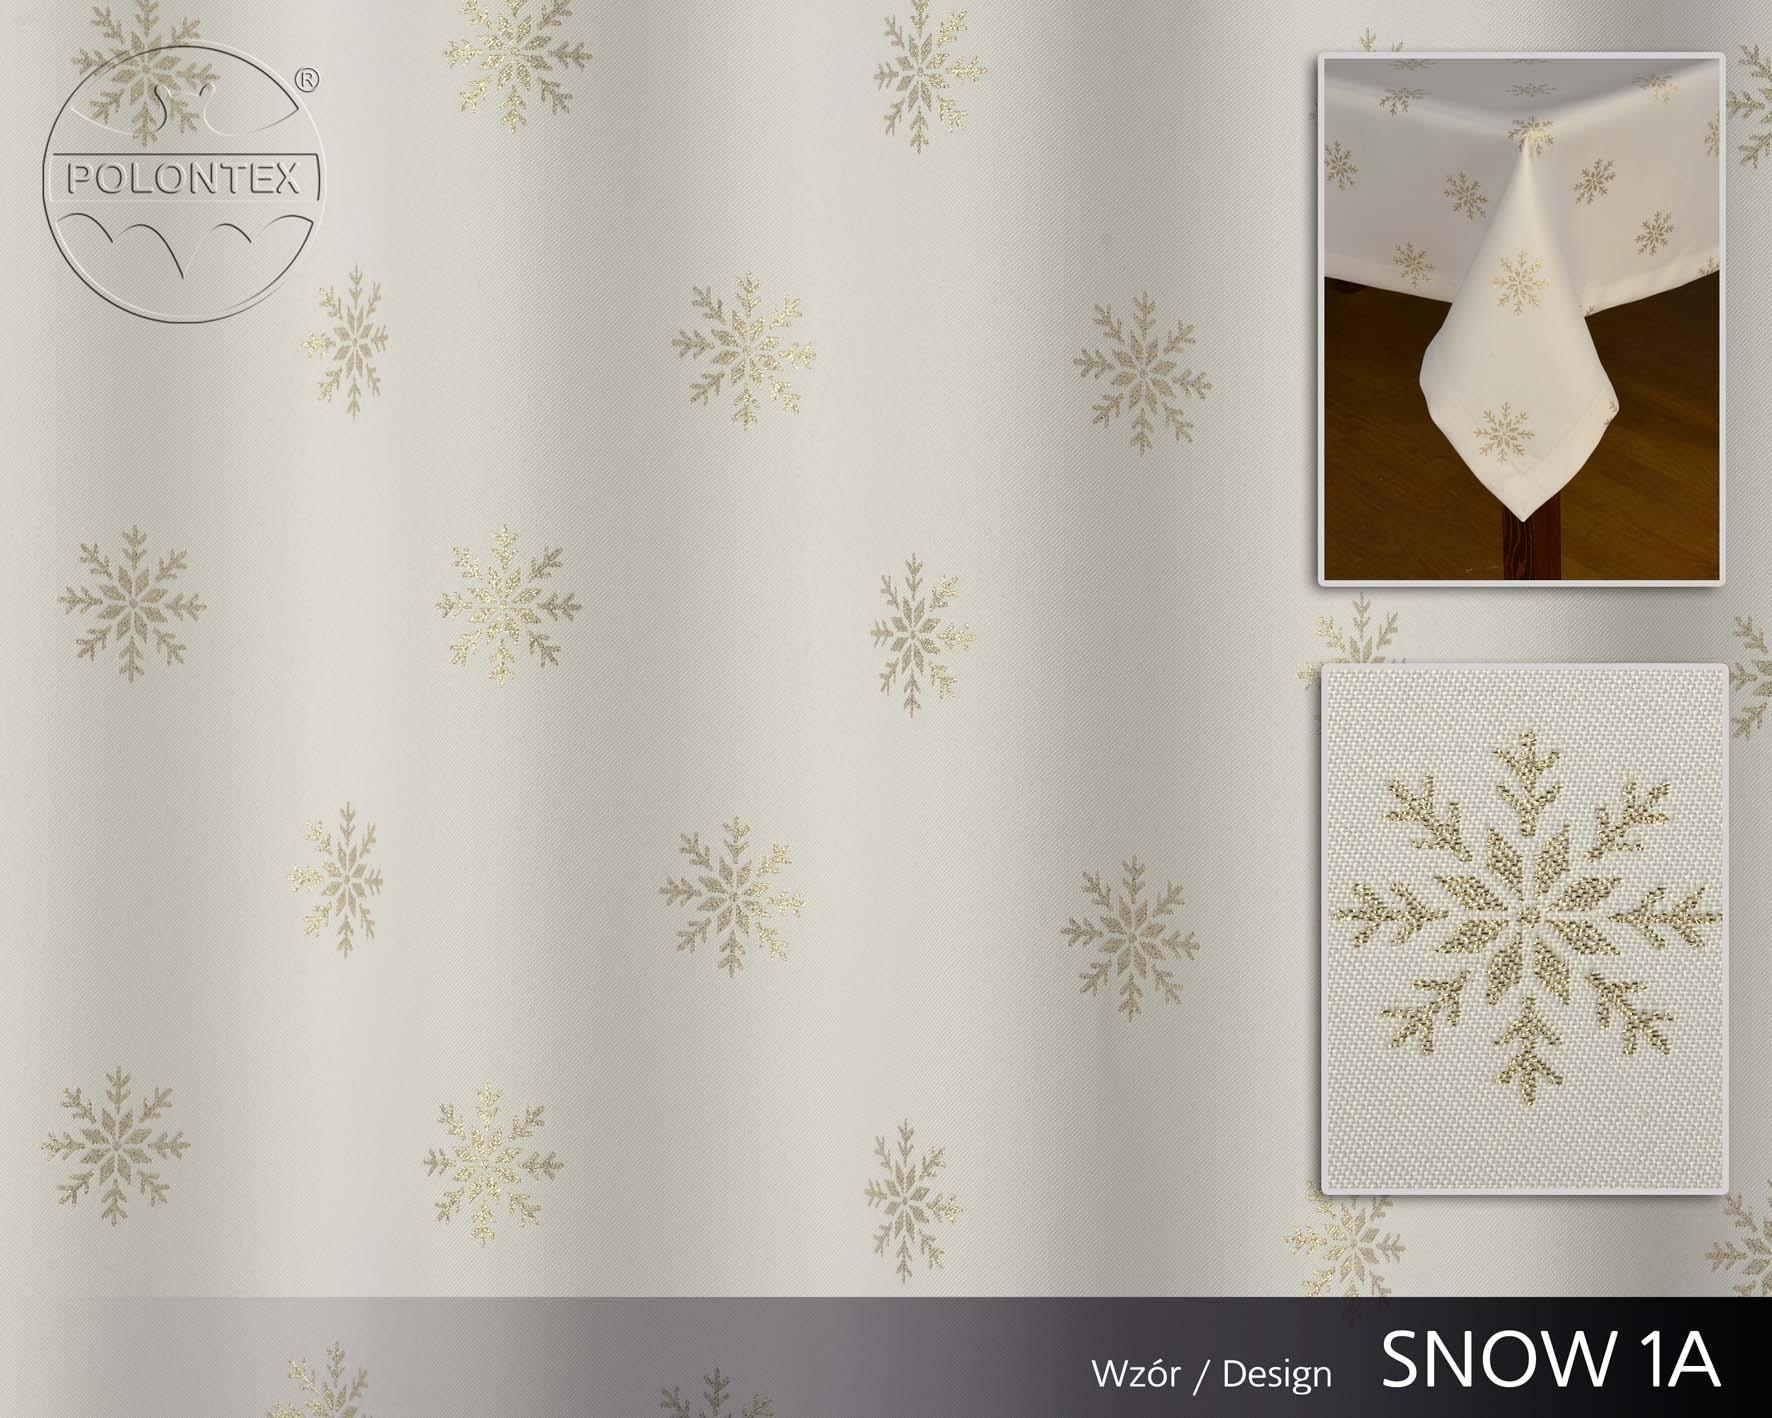 SNOW 1A